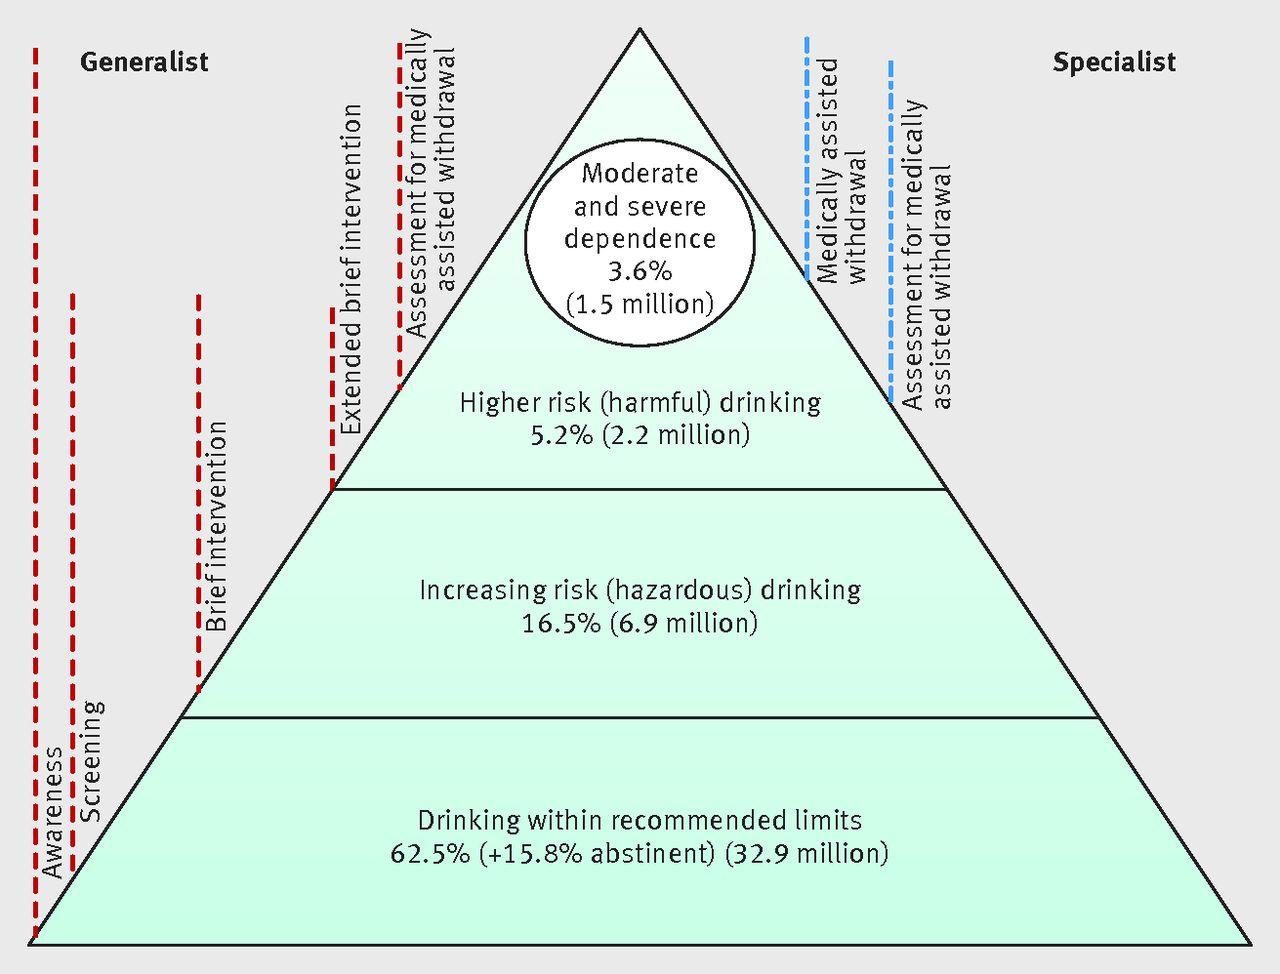 dsm 5 diagnostic criteria for alcohol use disorder